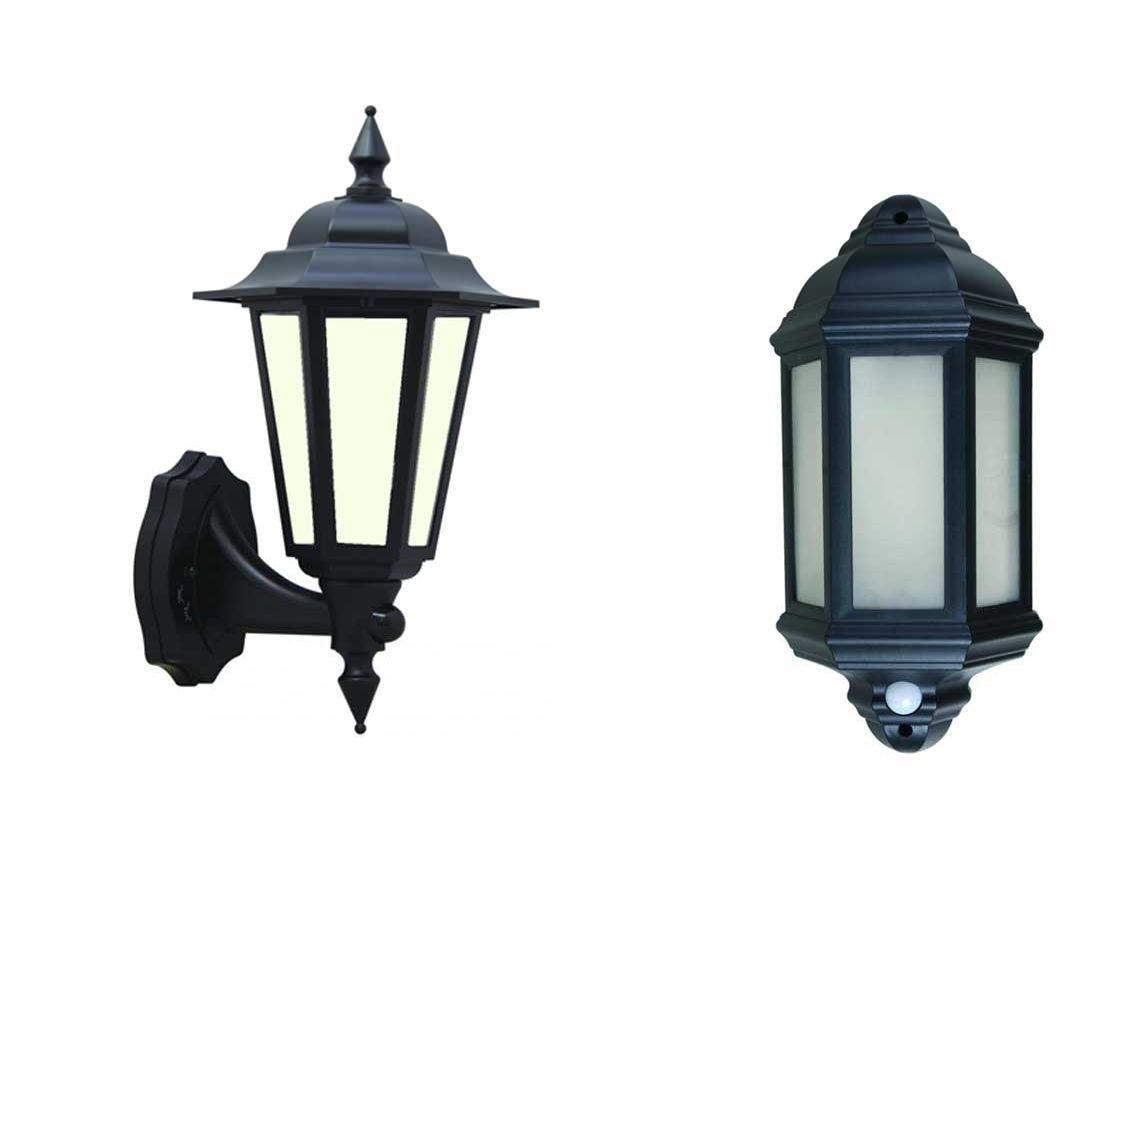 Led Outdoor Garden Wall Half Lantern Pir Black Ip44 External 7 Watt throughout Outdoor Pir Lanterns (Image 9 of 20)